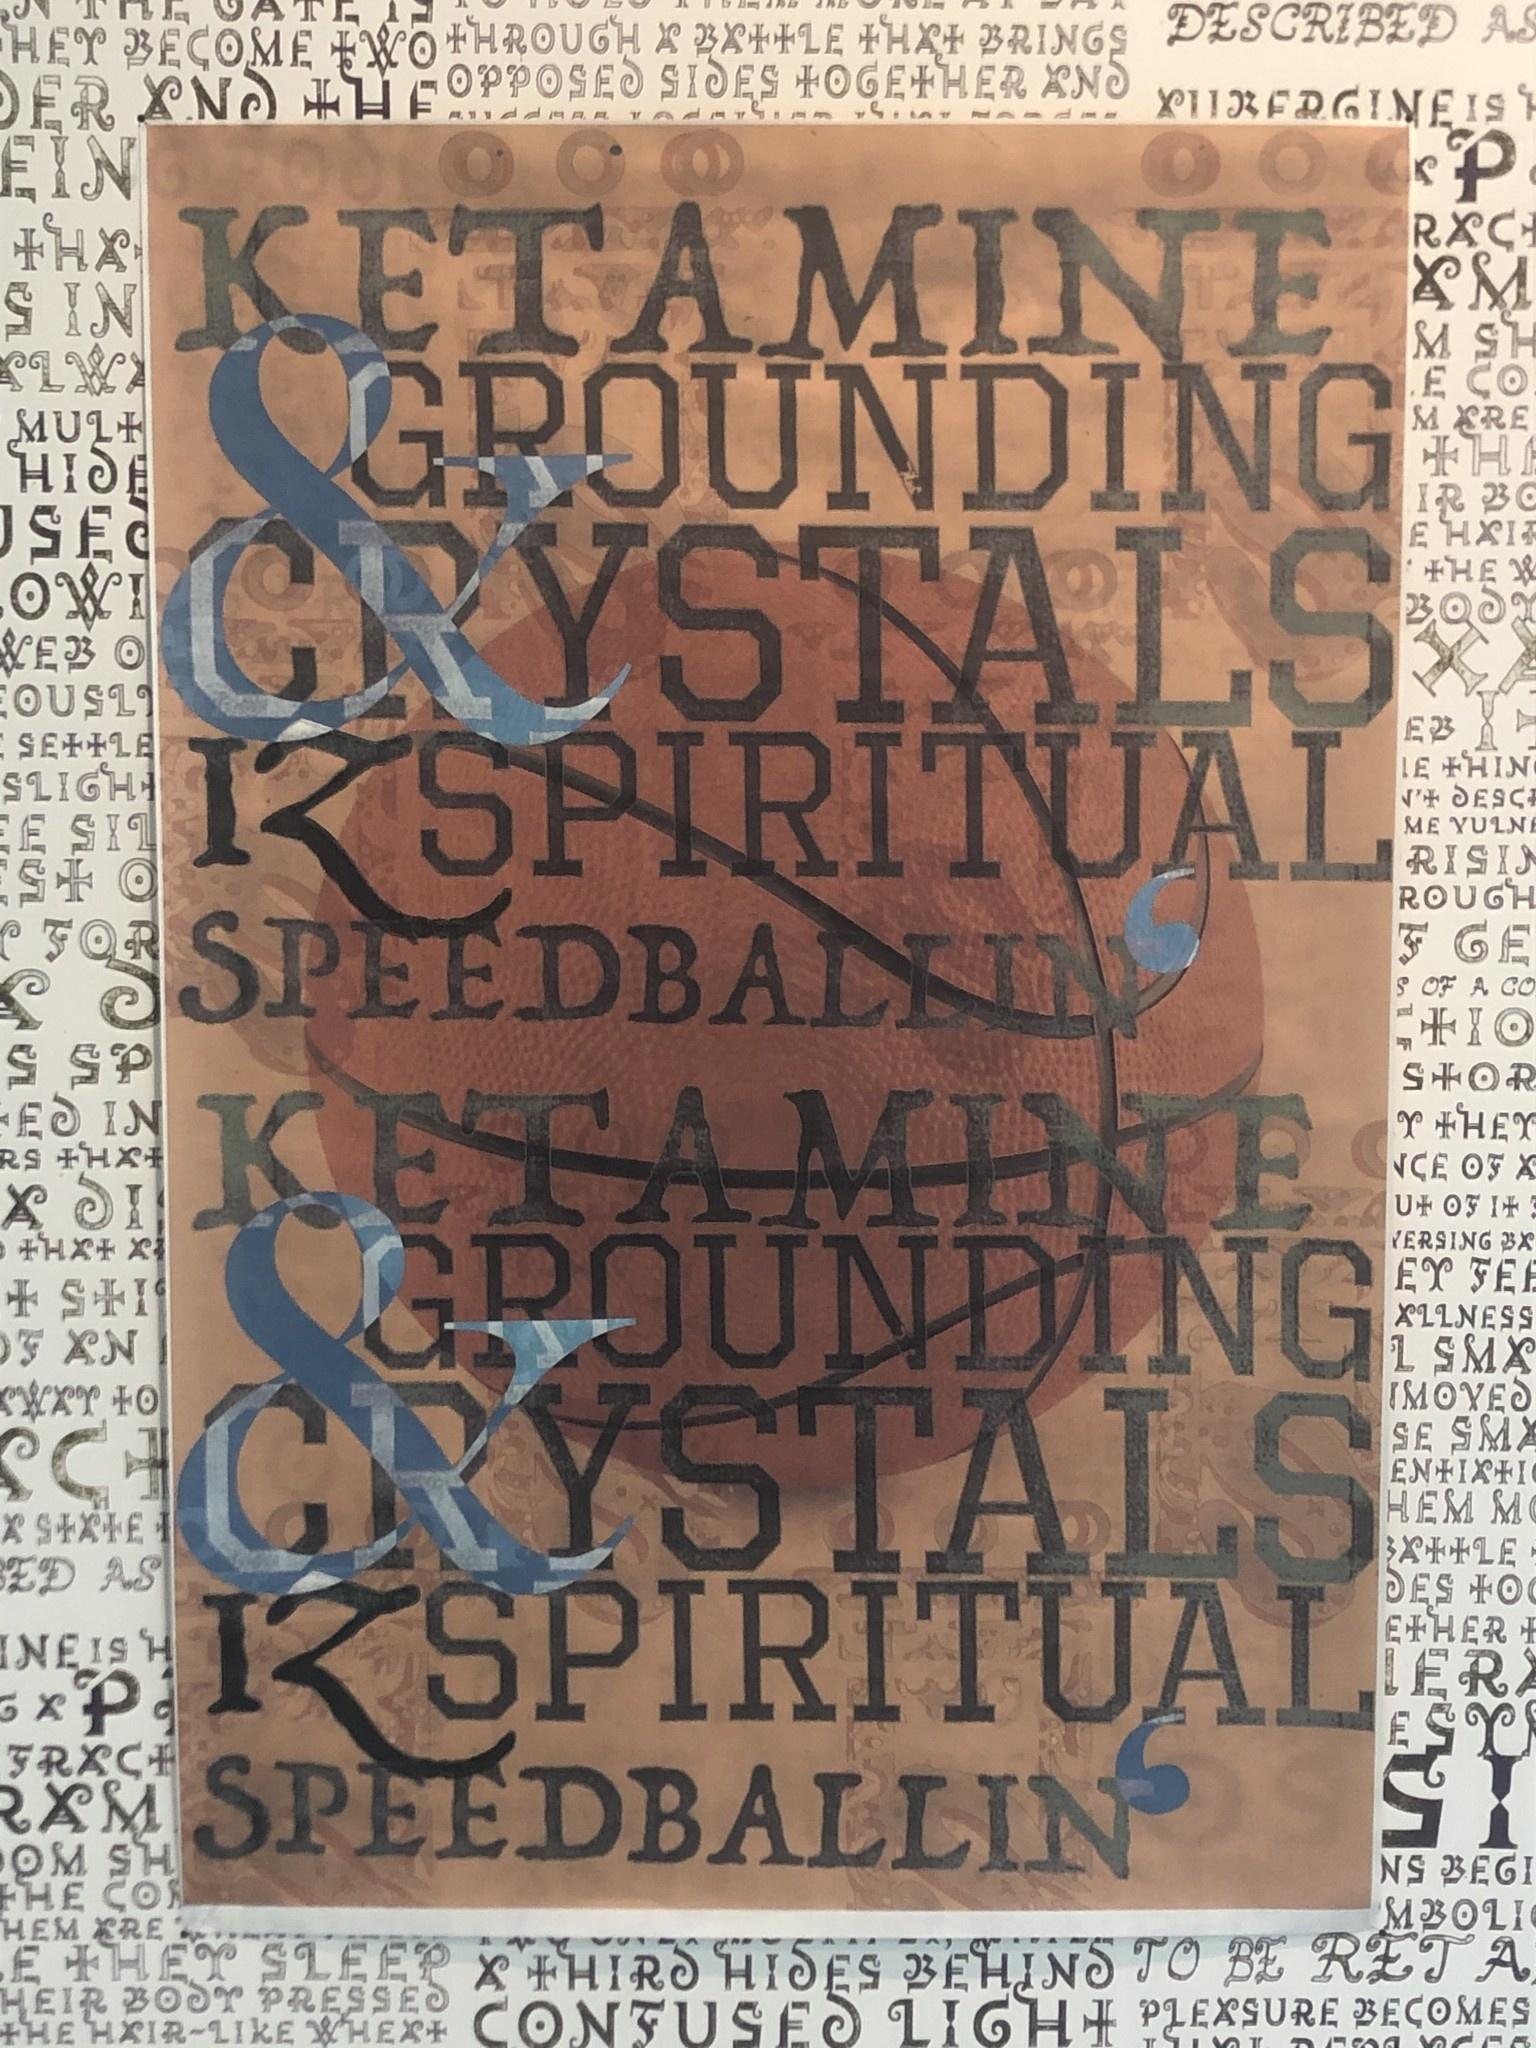 Spiritual Speedballin' poster-1